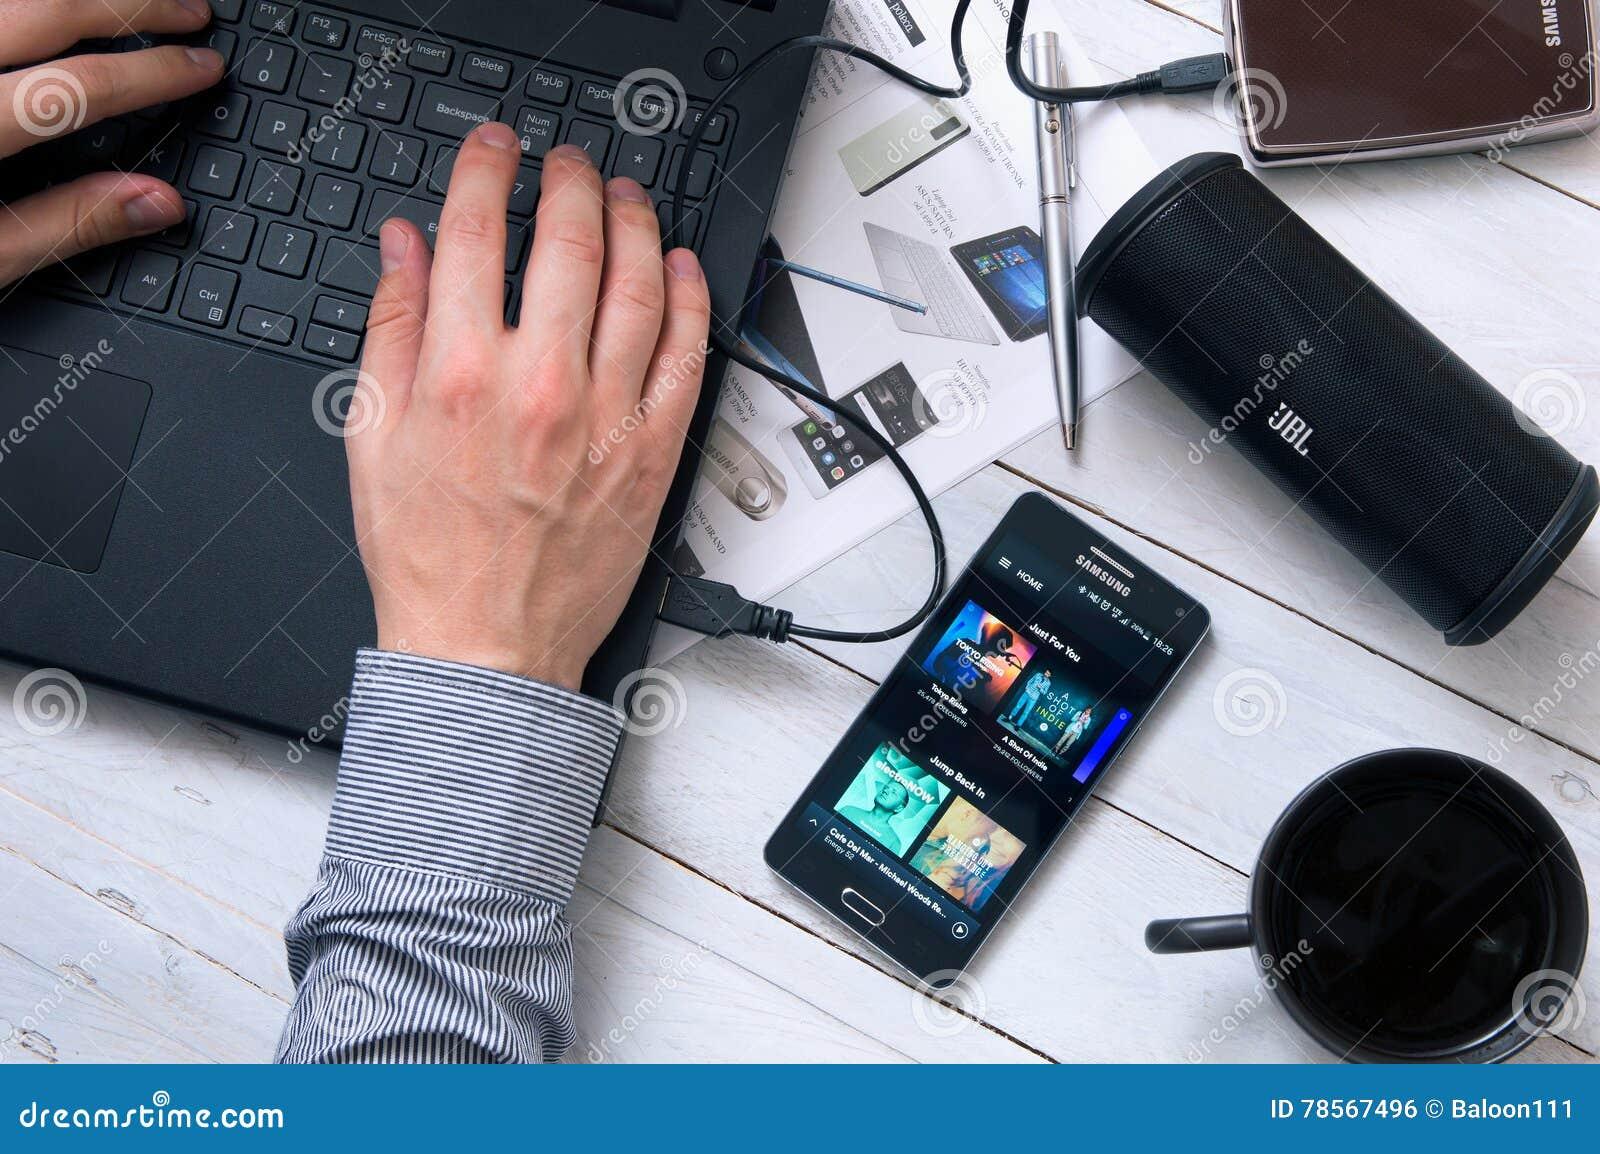 Man uses Spotify application